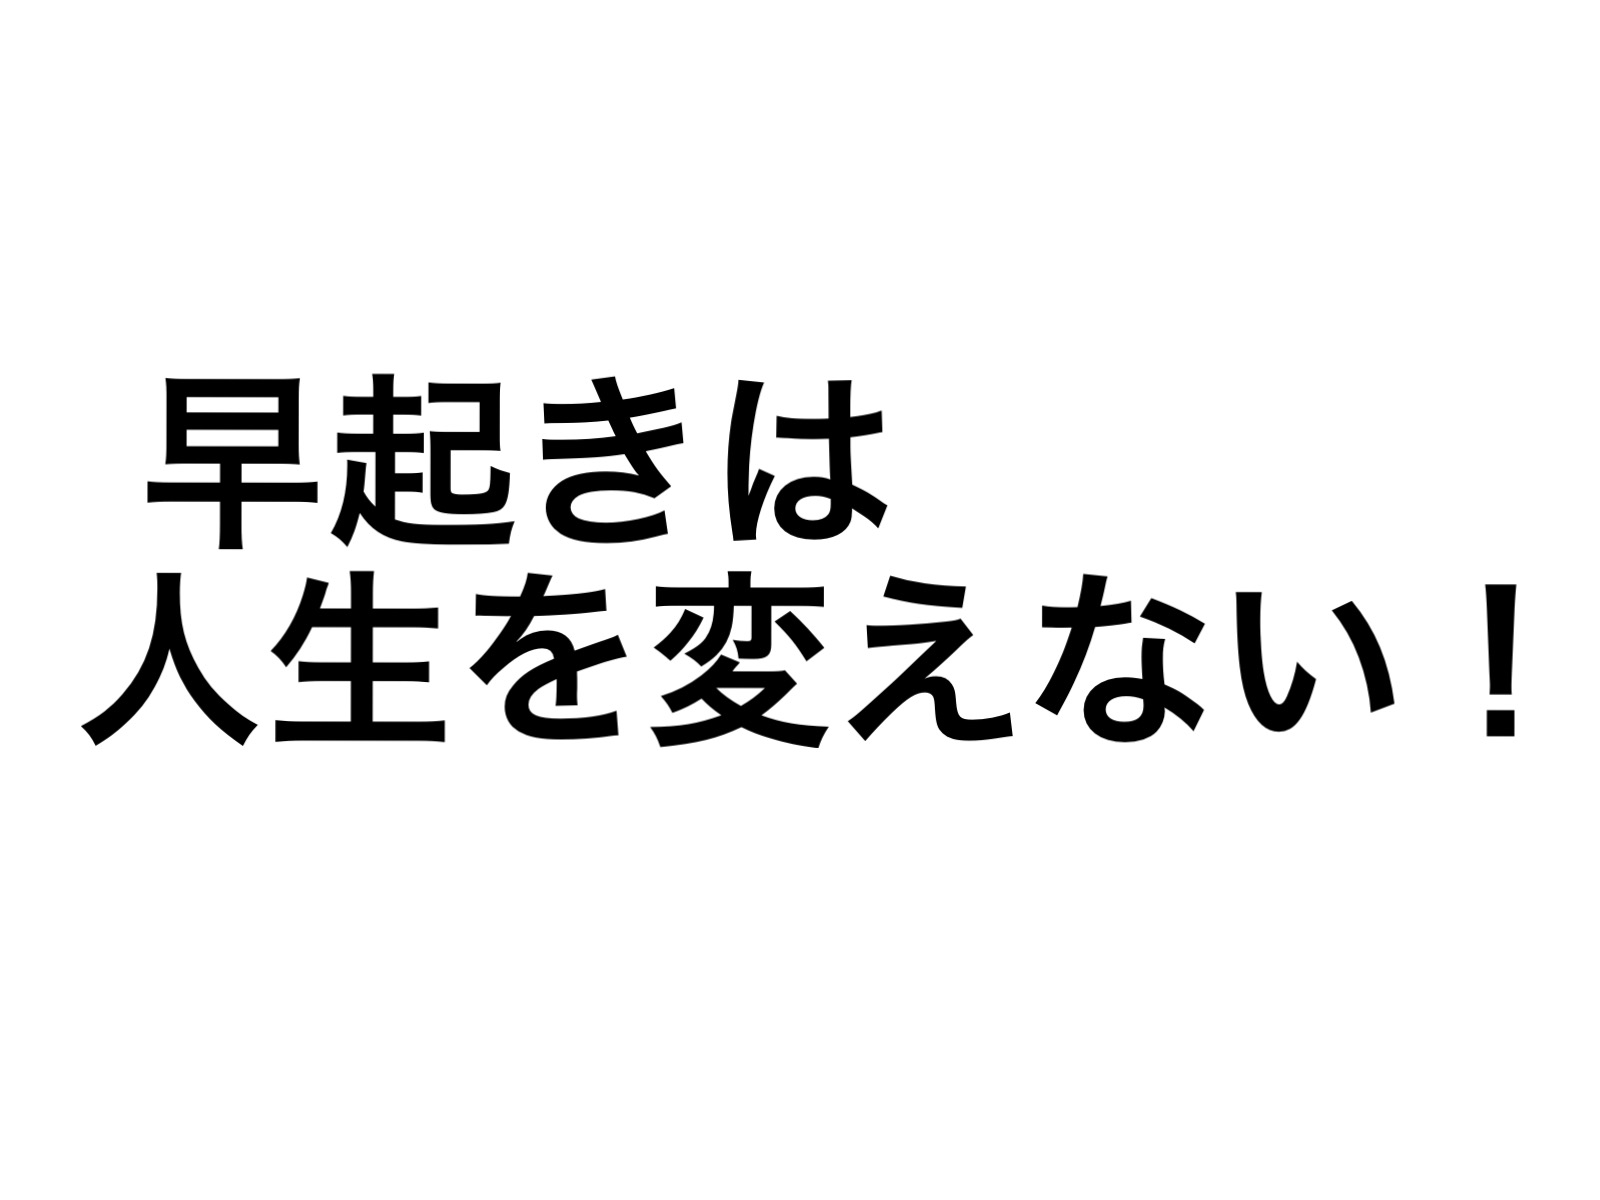 2016 11 03 11 08 16